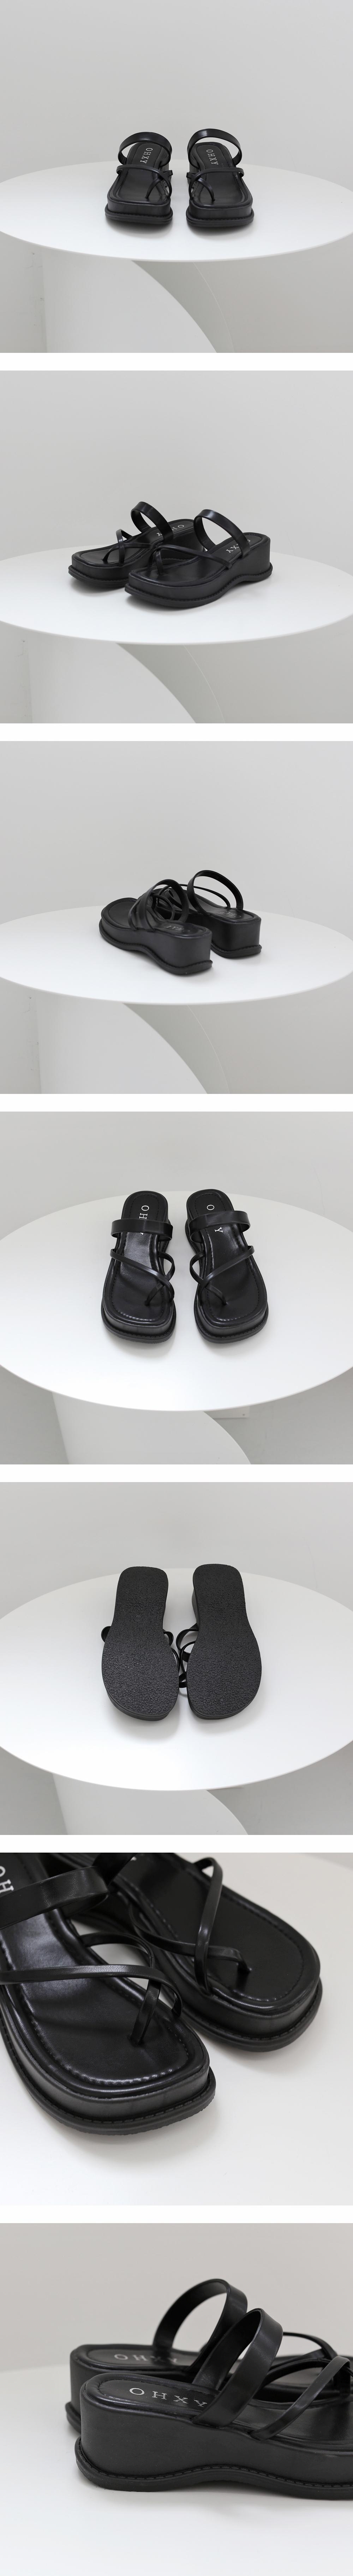 Runnin Strap Platform Slippers